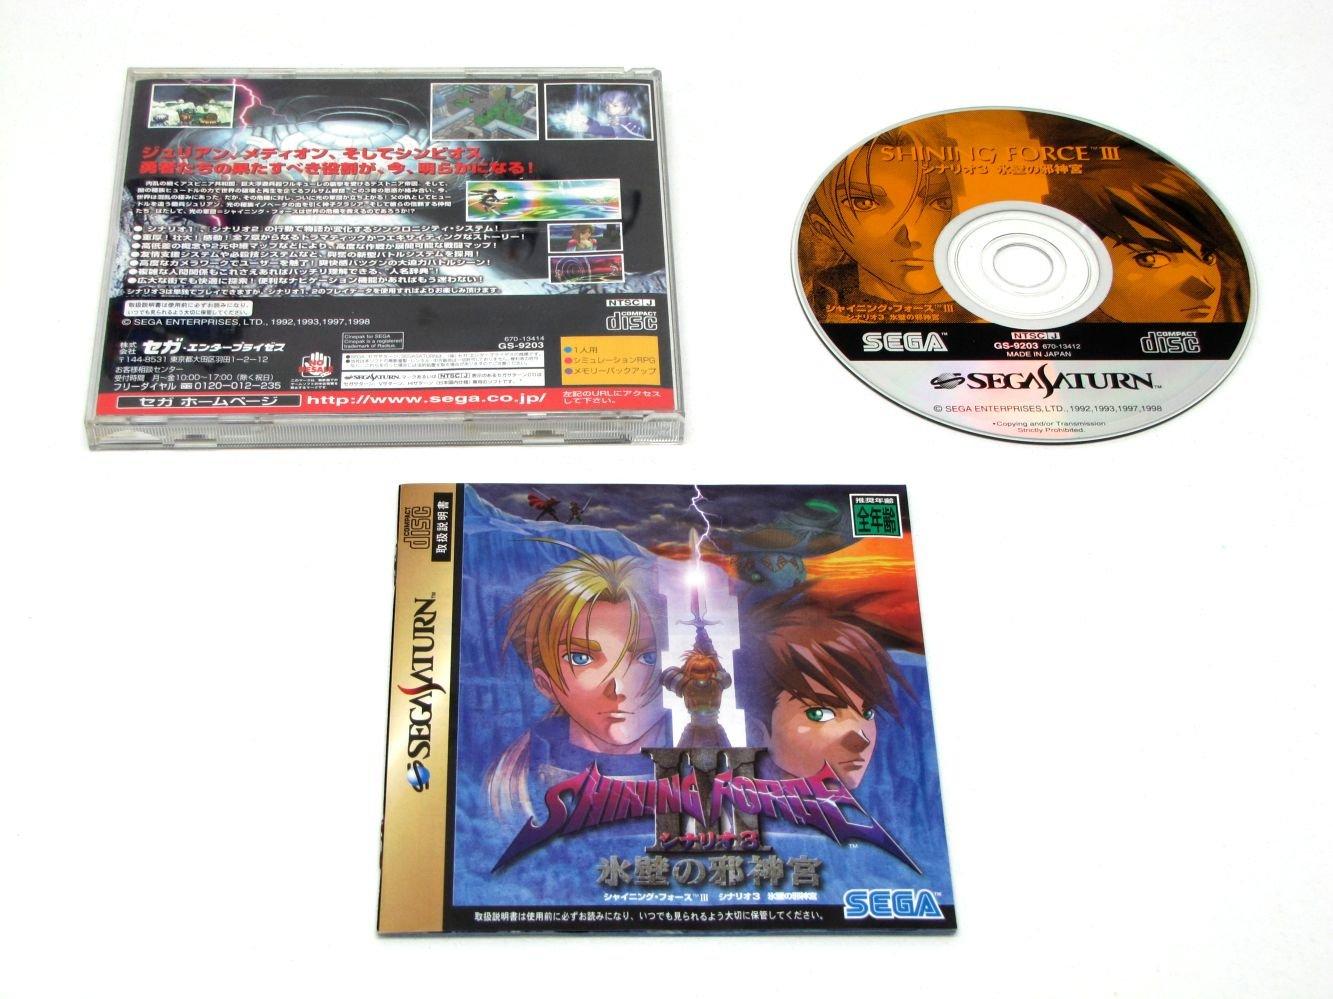 Amazon com: Shining Force III Scenario 3 [Japan Import